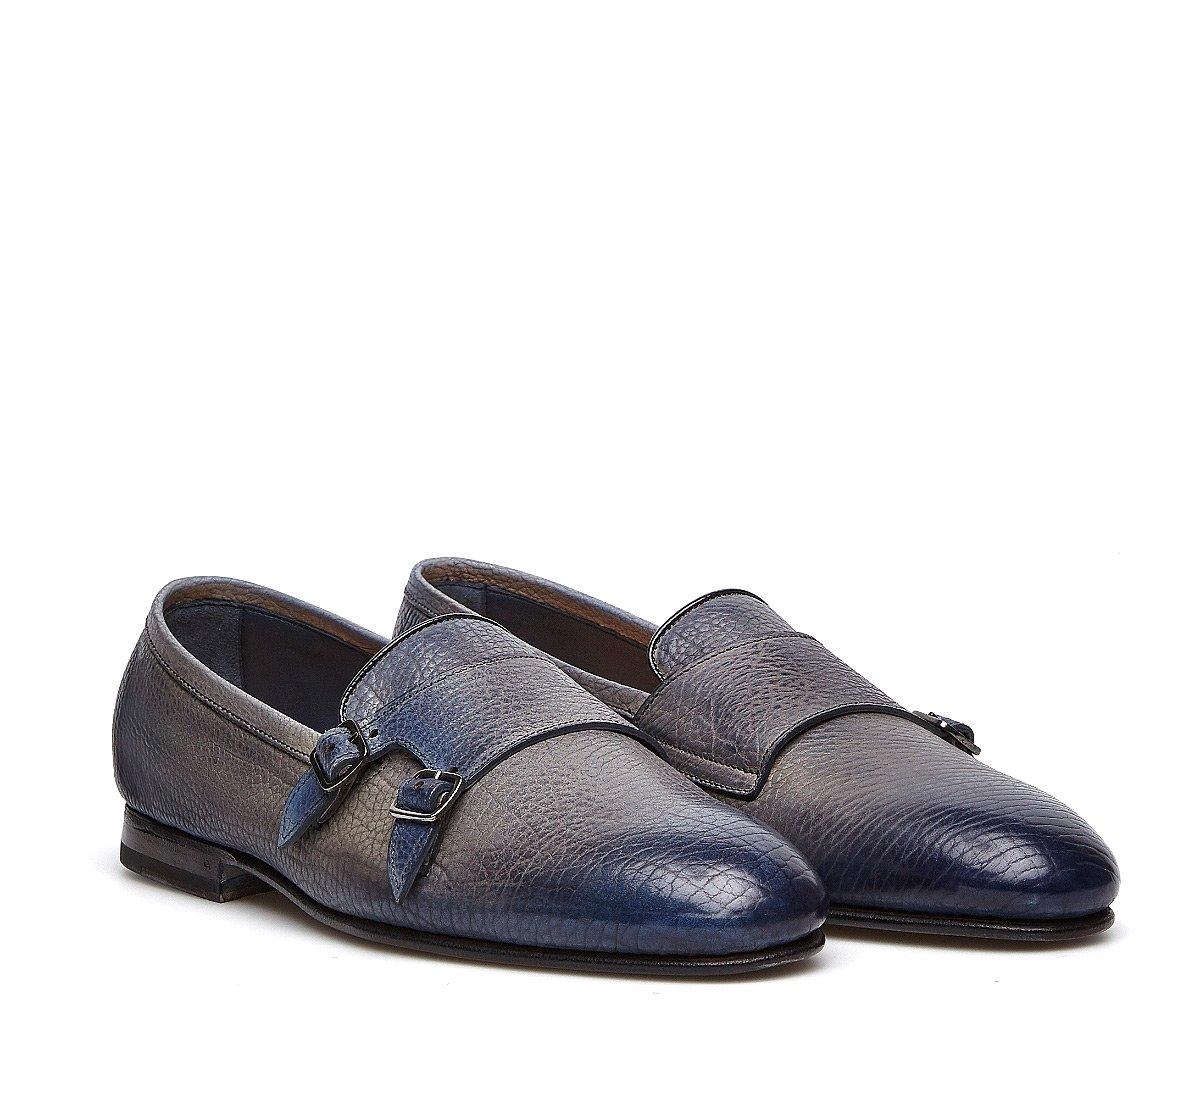 Fabi Flex Goodyear double monk-strap shoes in exquisite hand-buffed calfskin